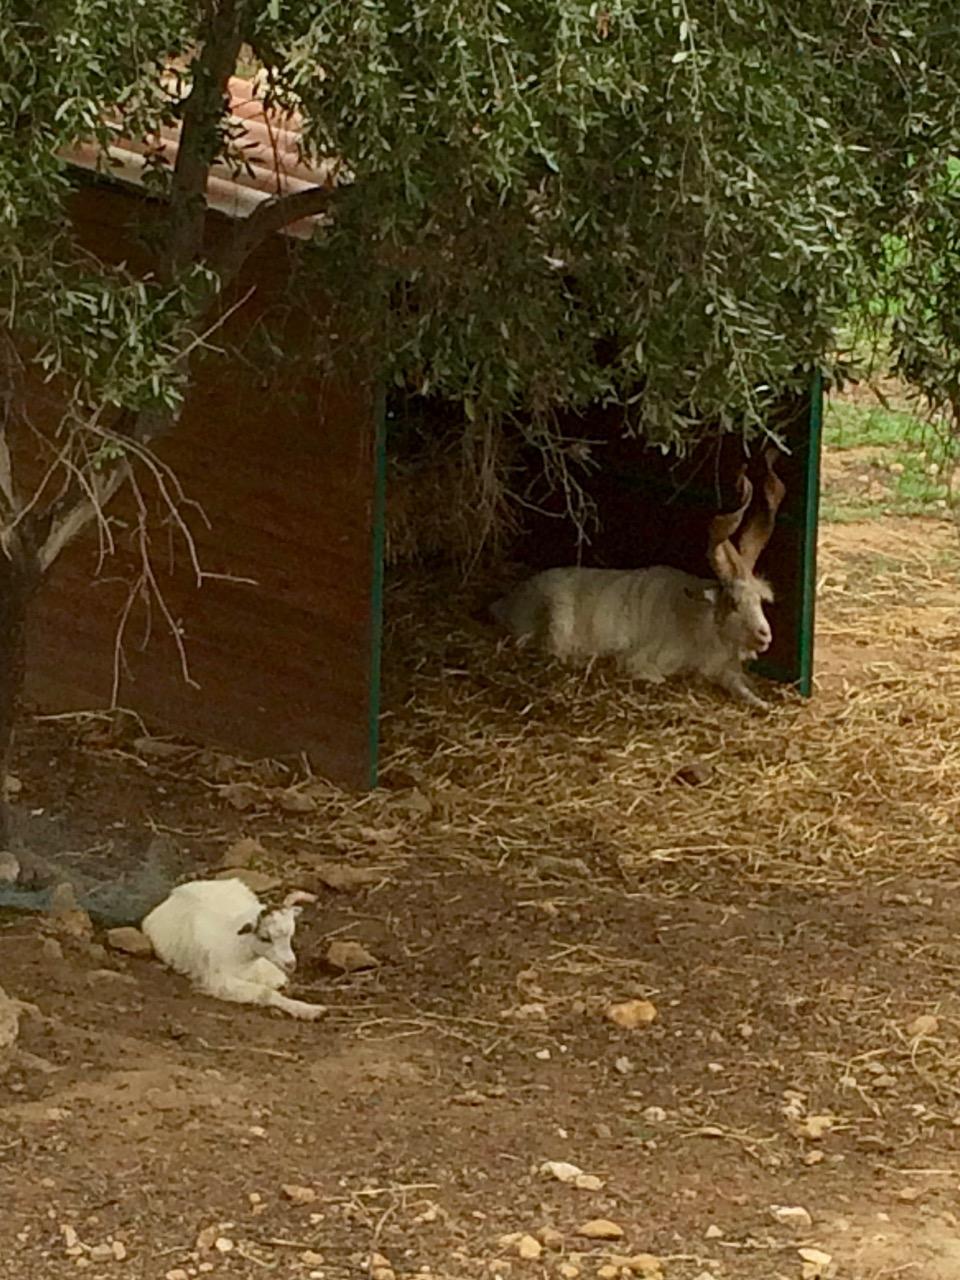 The Girgentana goats